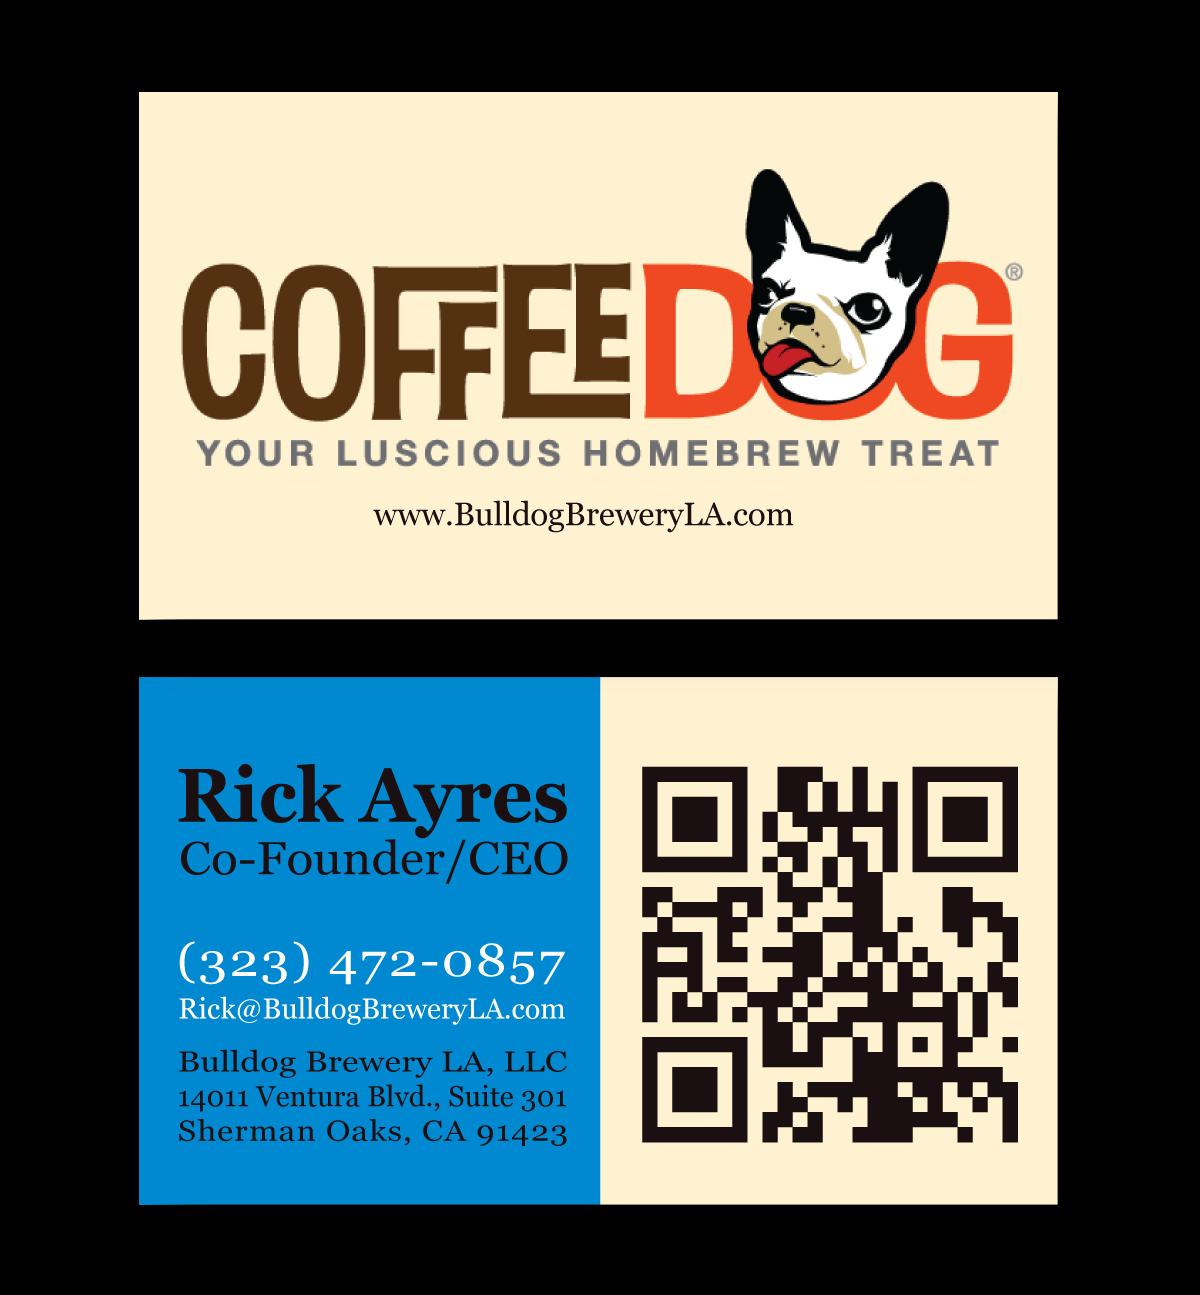 Bulldog Brewery LA, LLC | CoffeeDog Kit